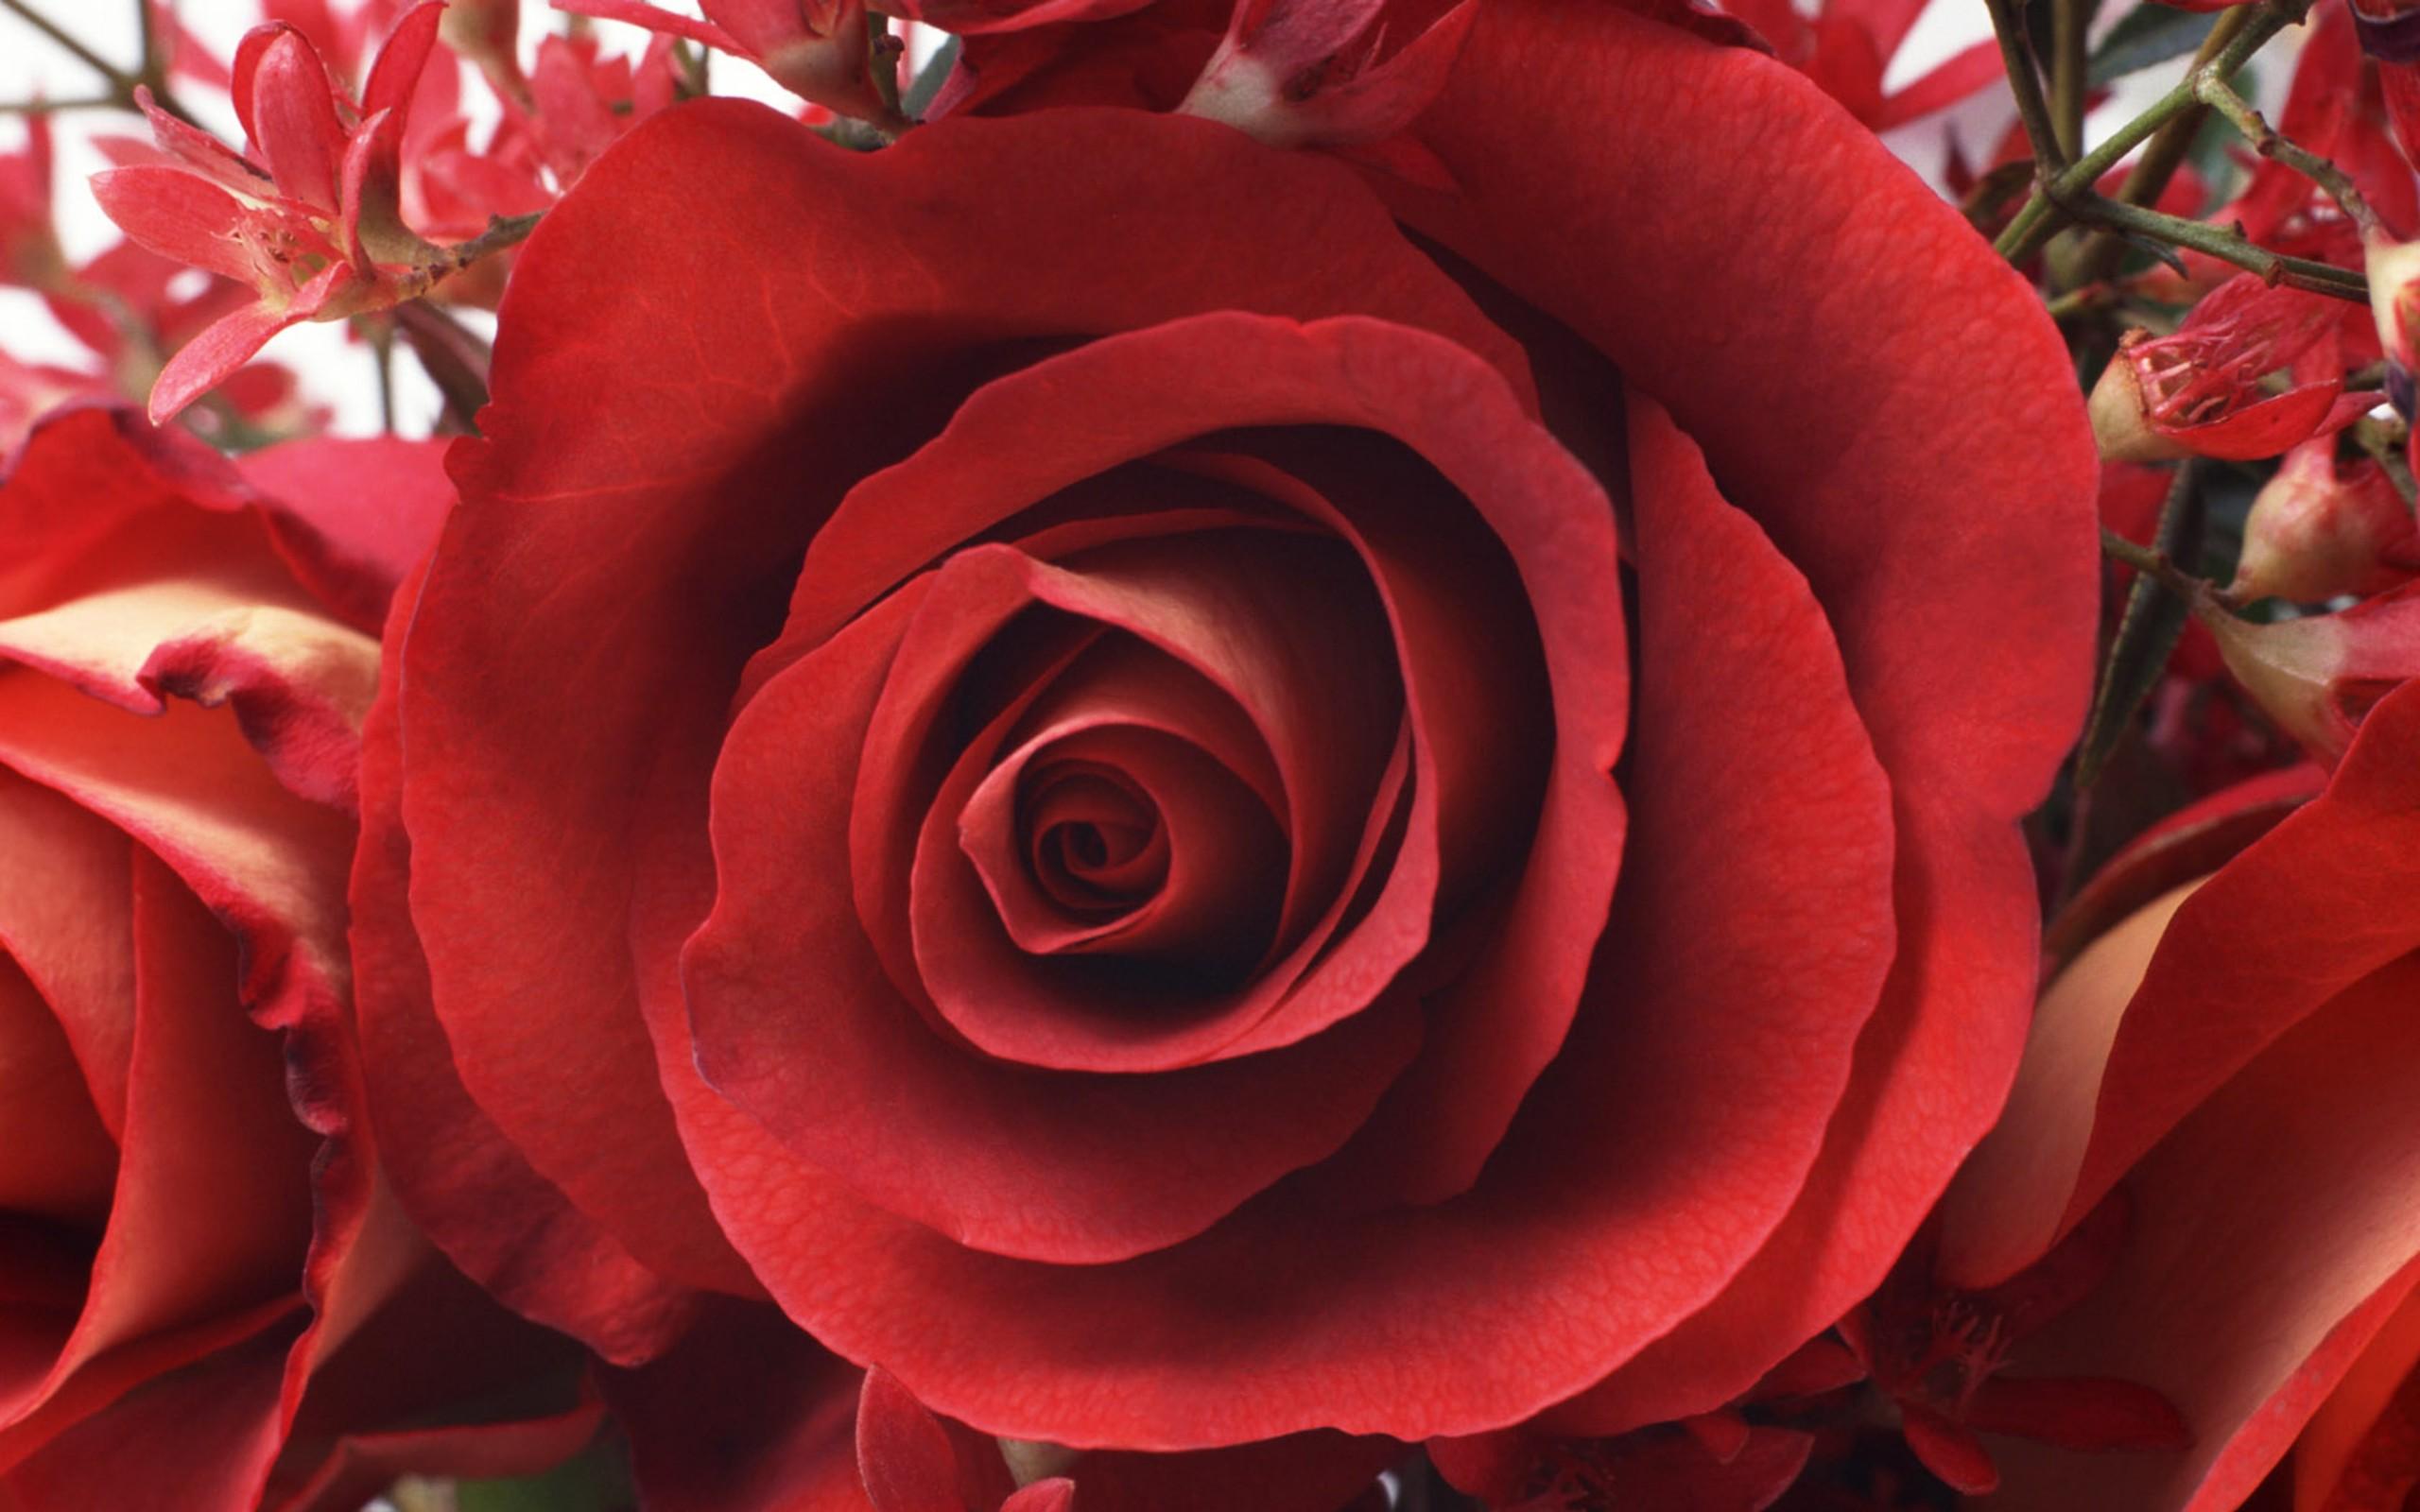 Картинке парню, розы на 8 марта картинки